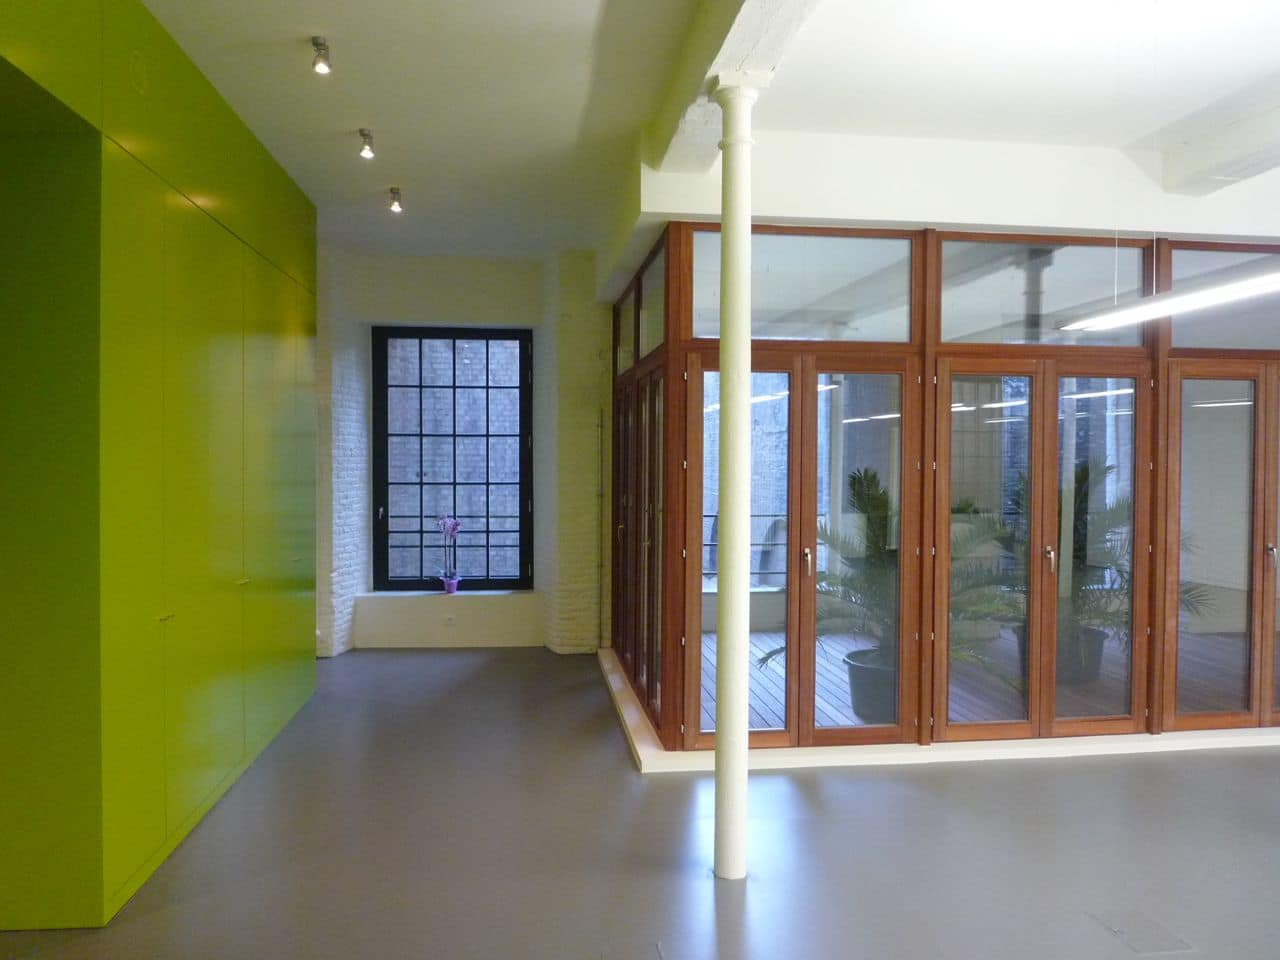 P1060684 | Baeyens & Beck architecten Gent | architect nieuwbouw renovatie interieur | high end | architectenbureau